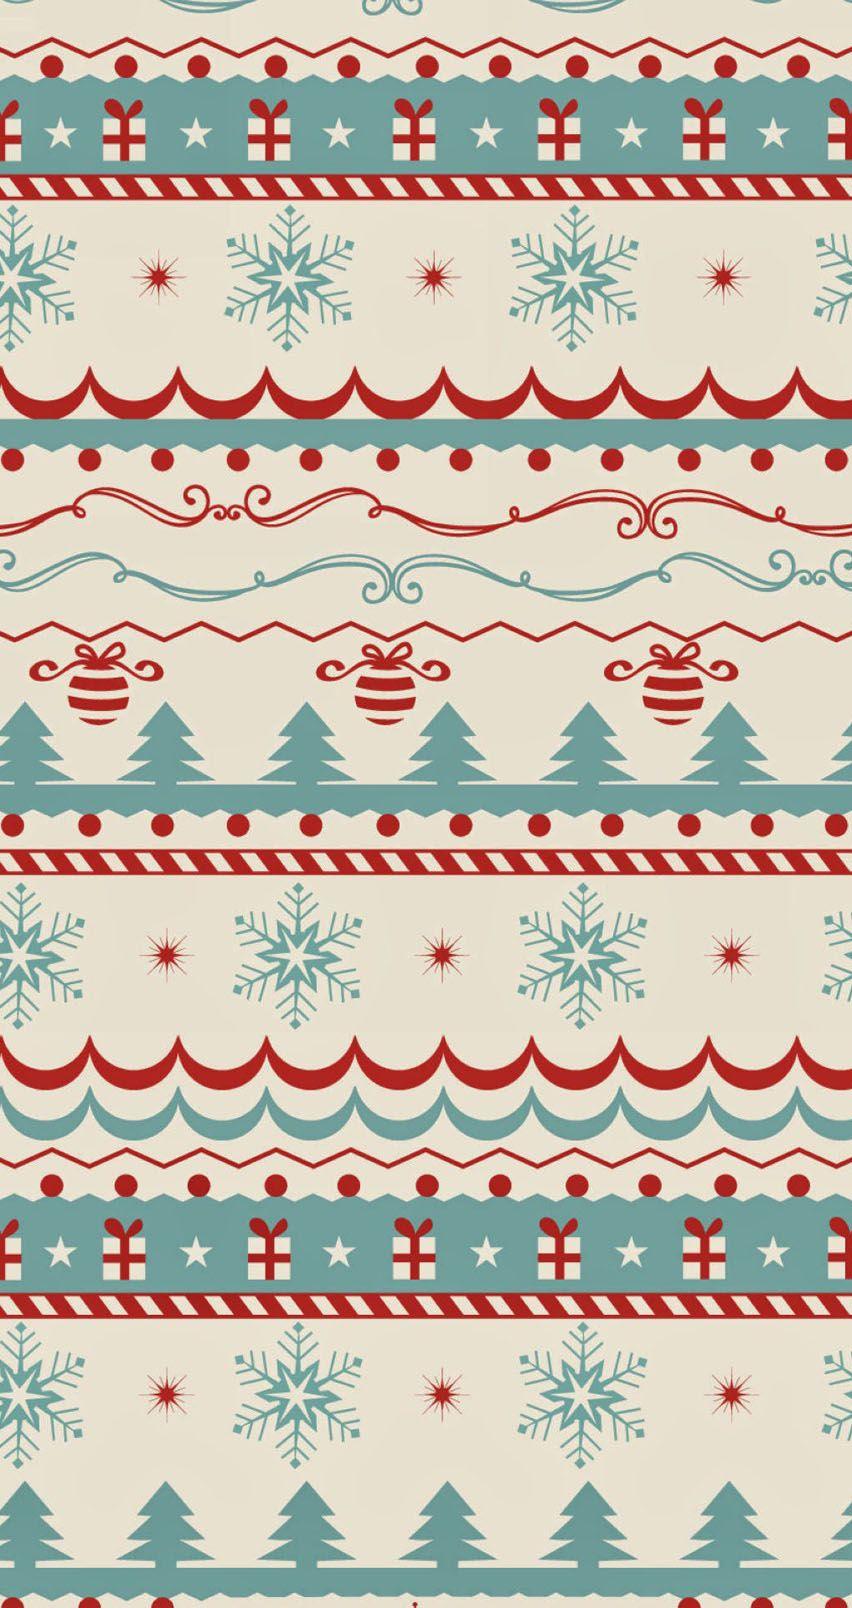 Merry Christmas Background Christmas Phone Wallpaper Christmas Wallpaper Free Wallpaper Iphone Christmas